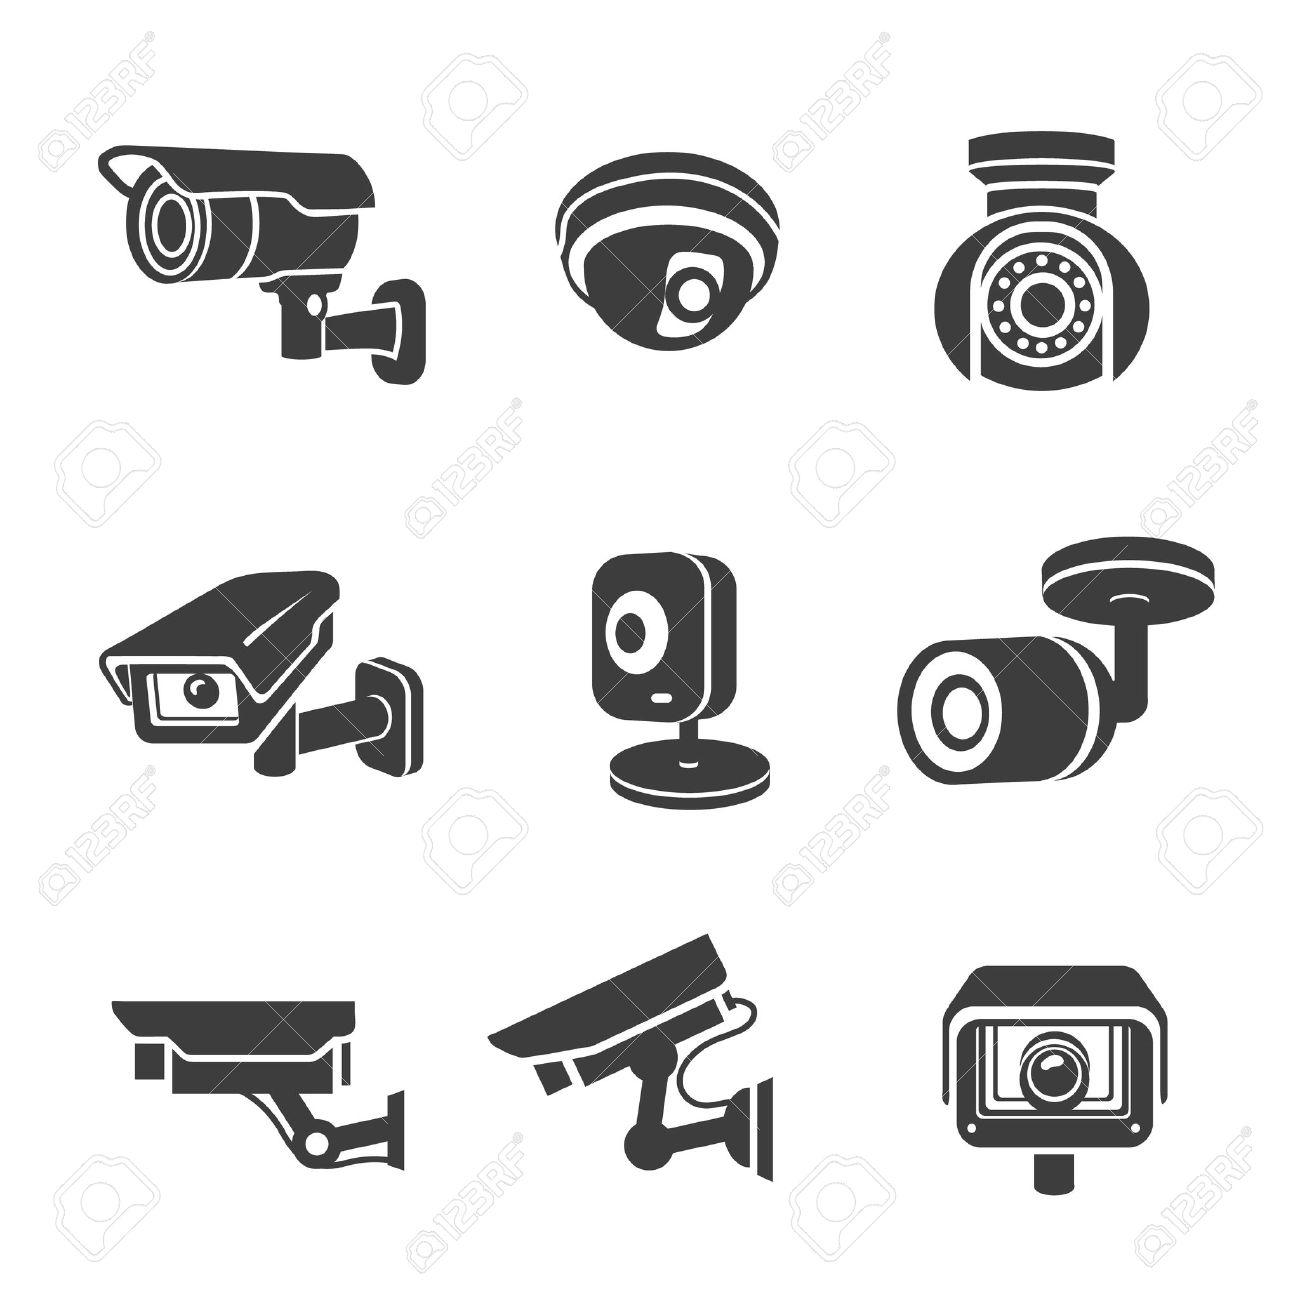 Video surveillance security cameras graphic icons pictograms set vector - 54602589